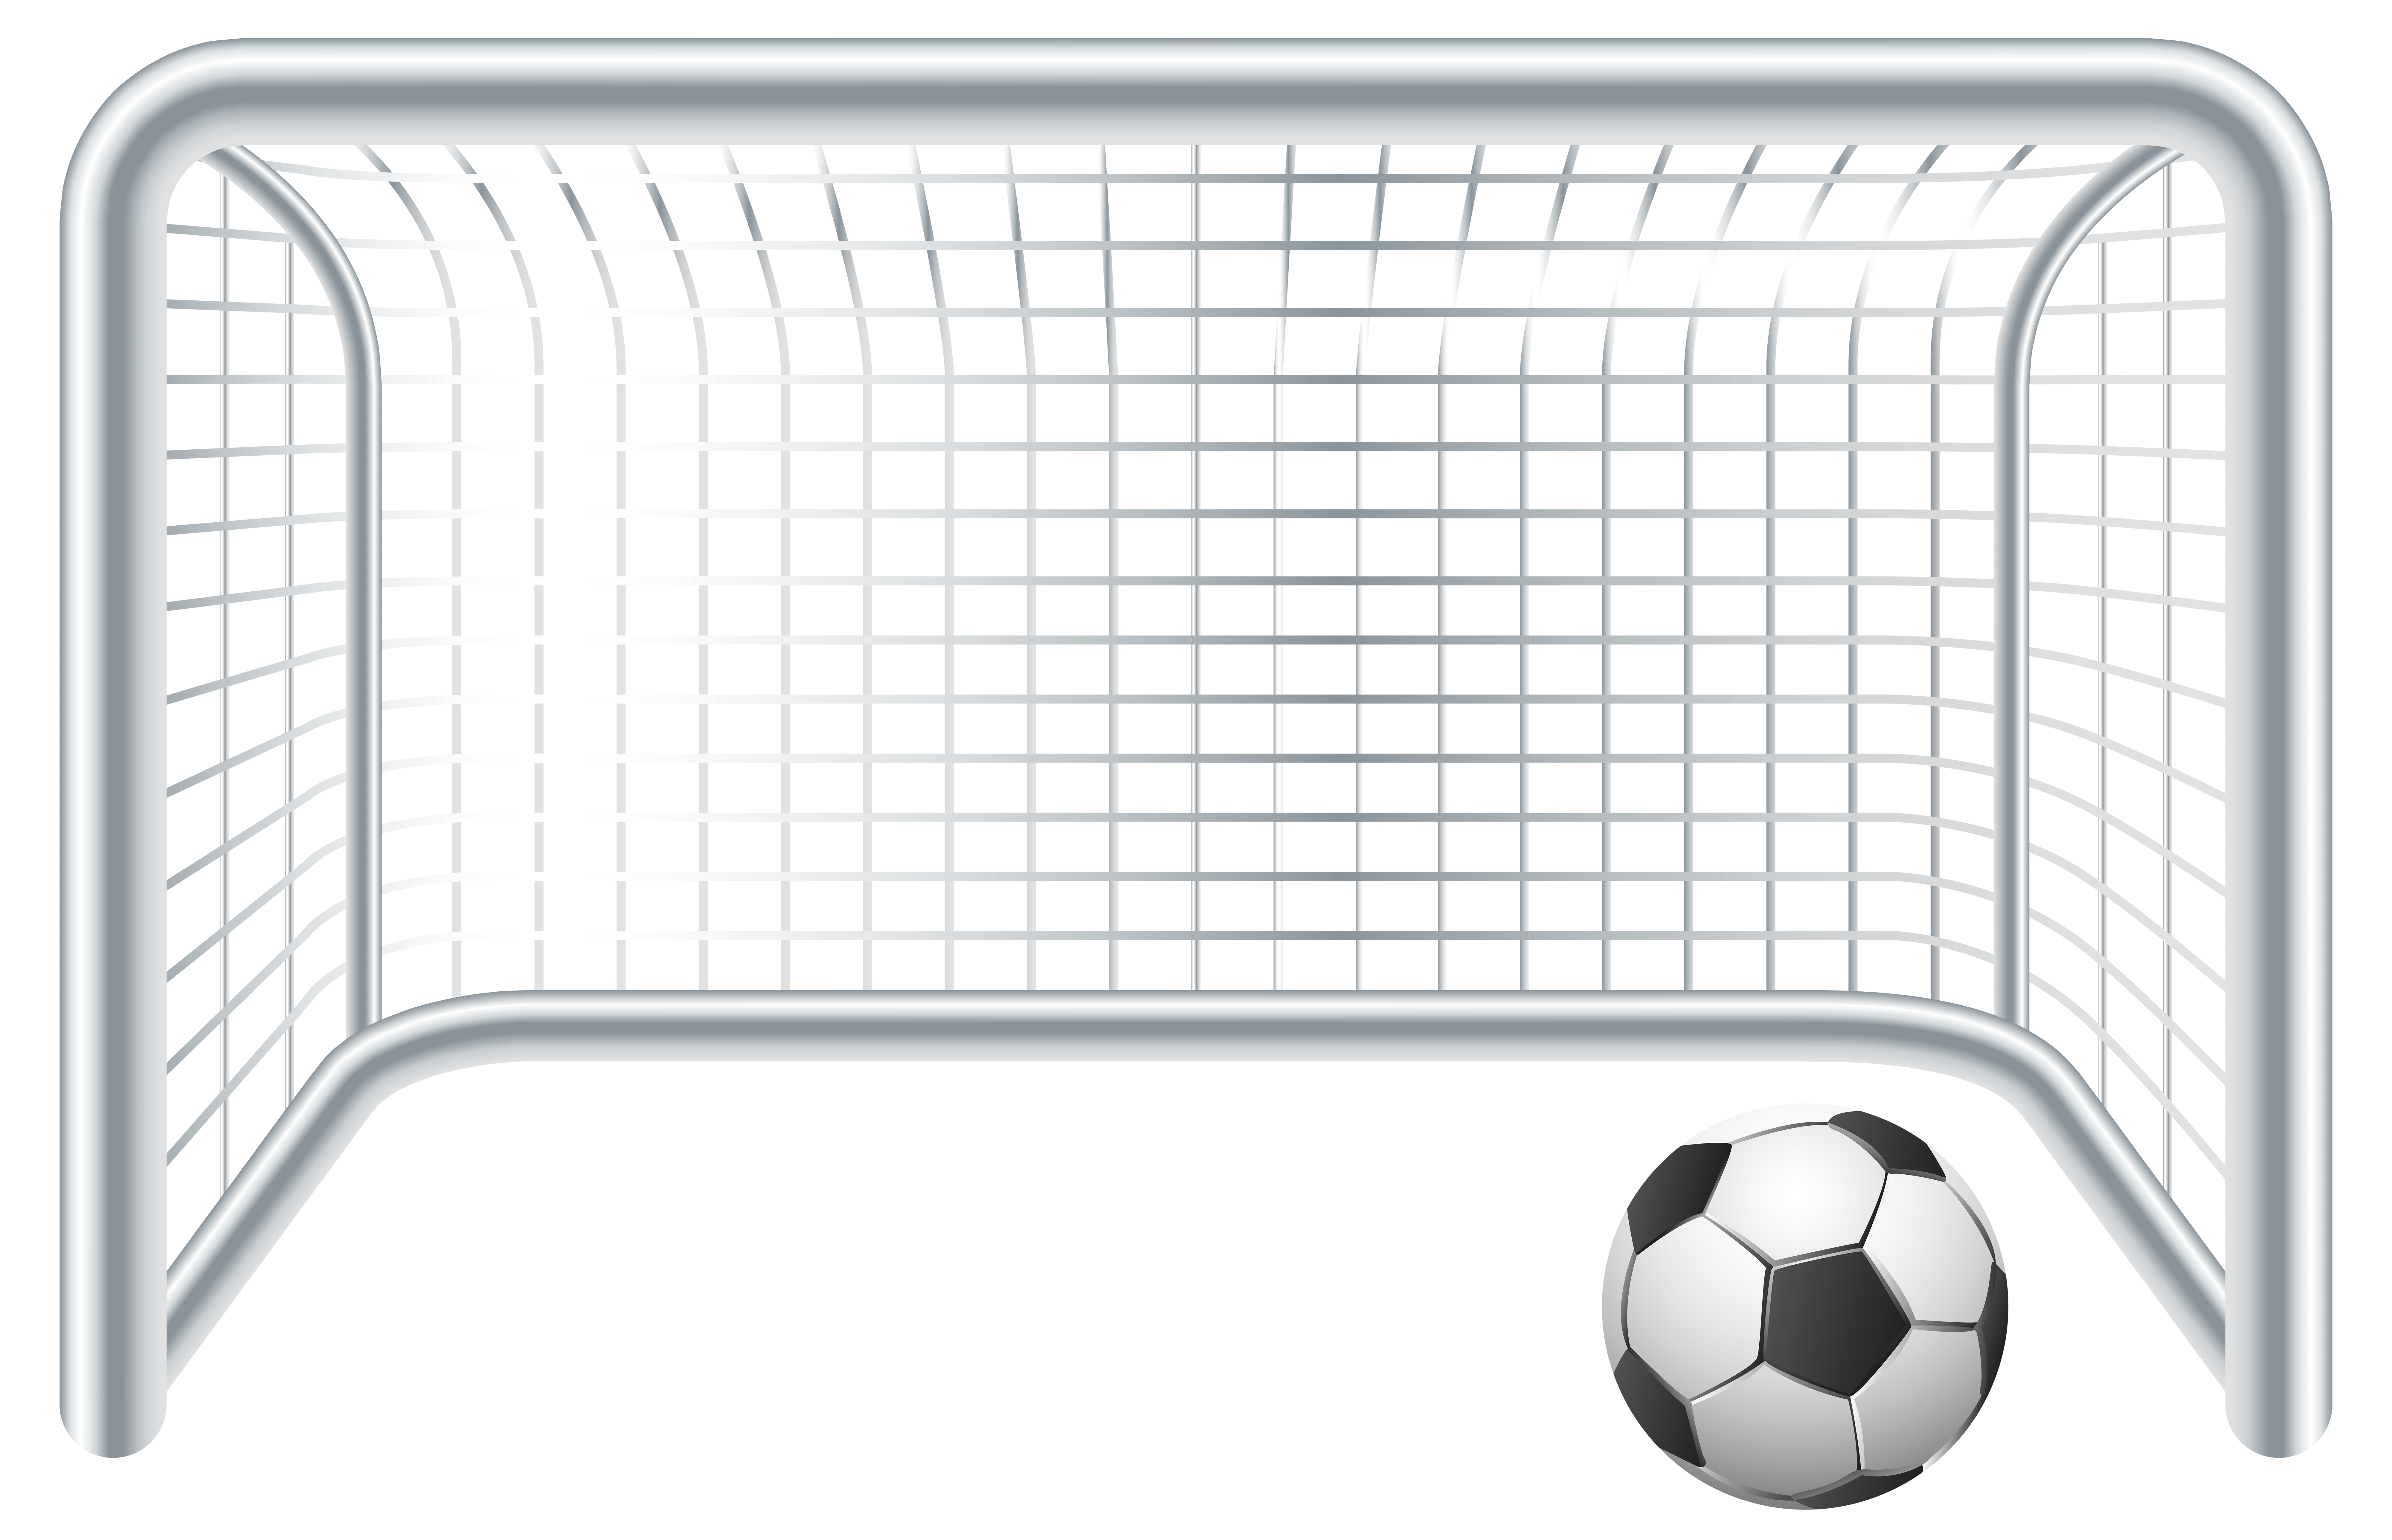 Soccer ball and goal. Clipart halloween gate